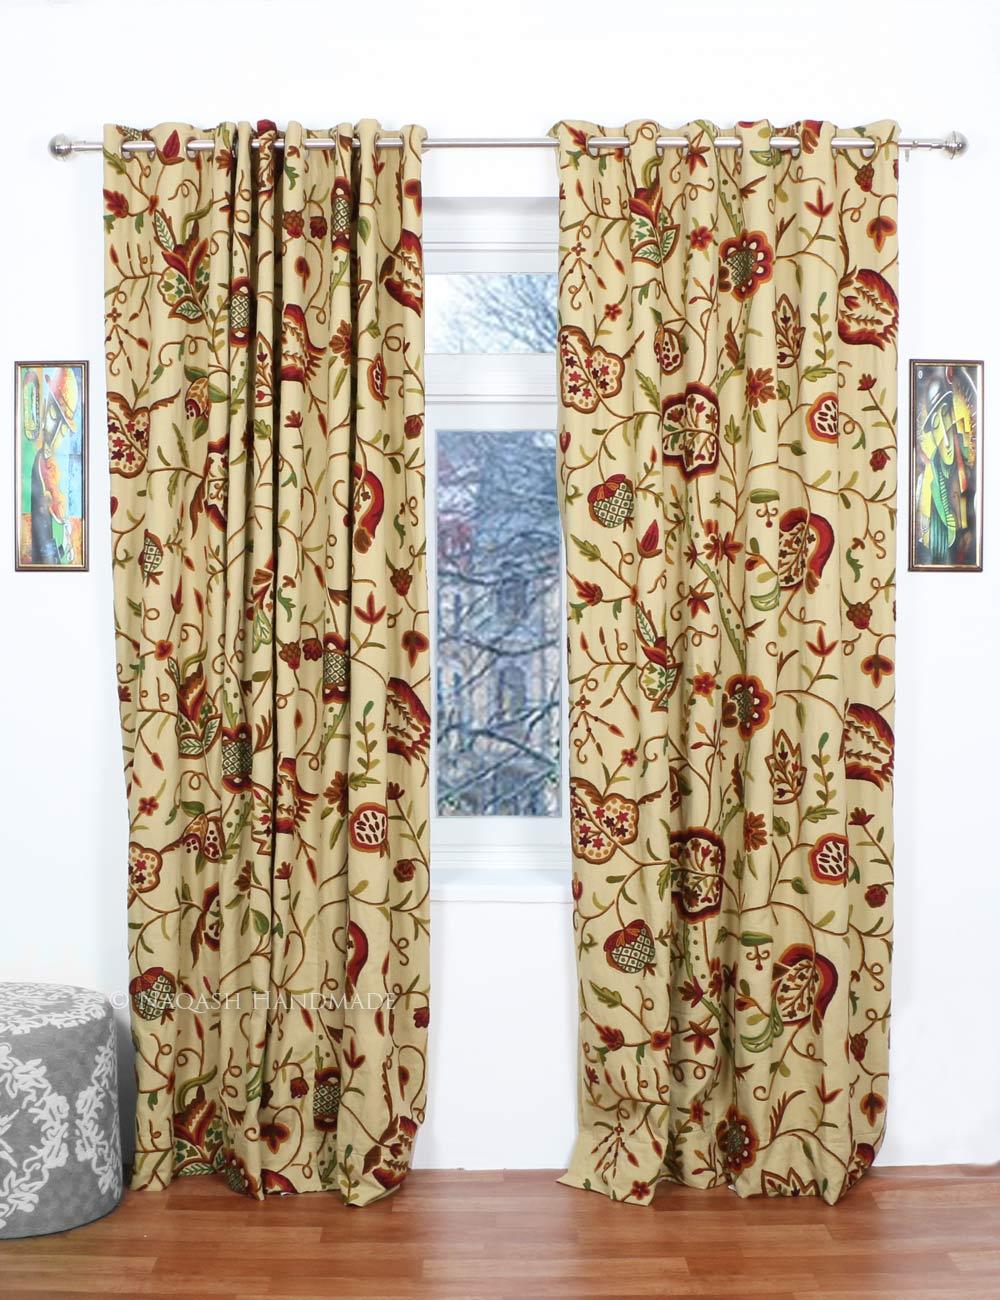 24 Inch Curtains | Blackout Panels | Kohls Drapes